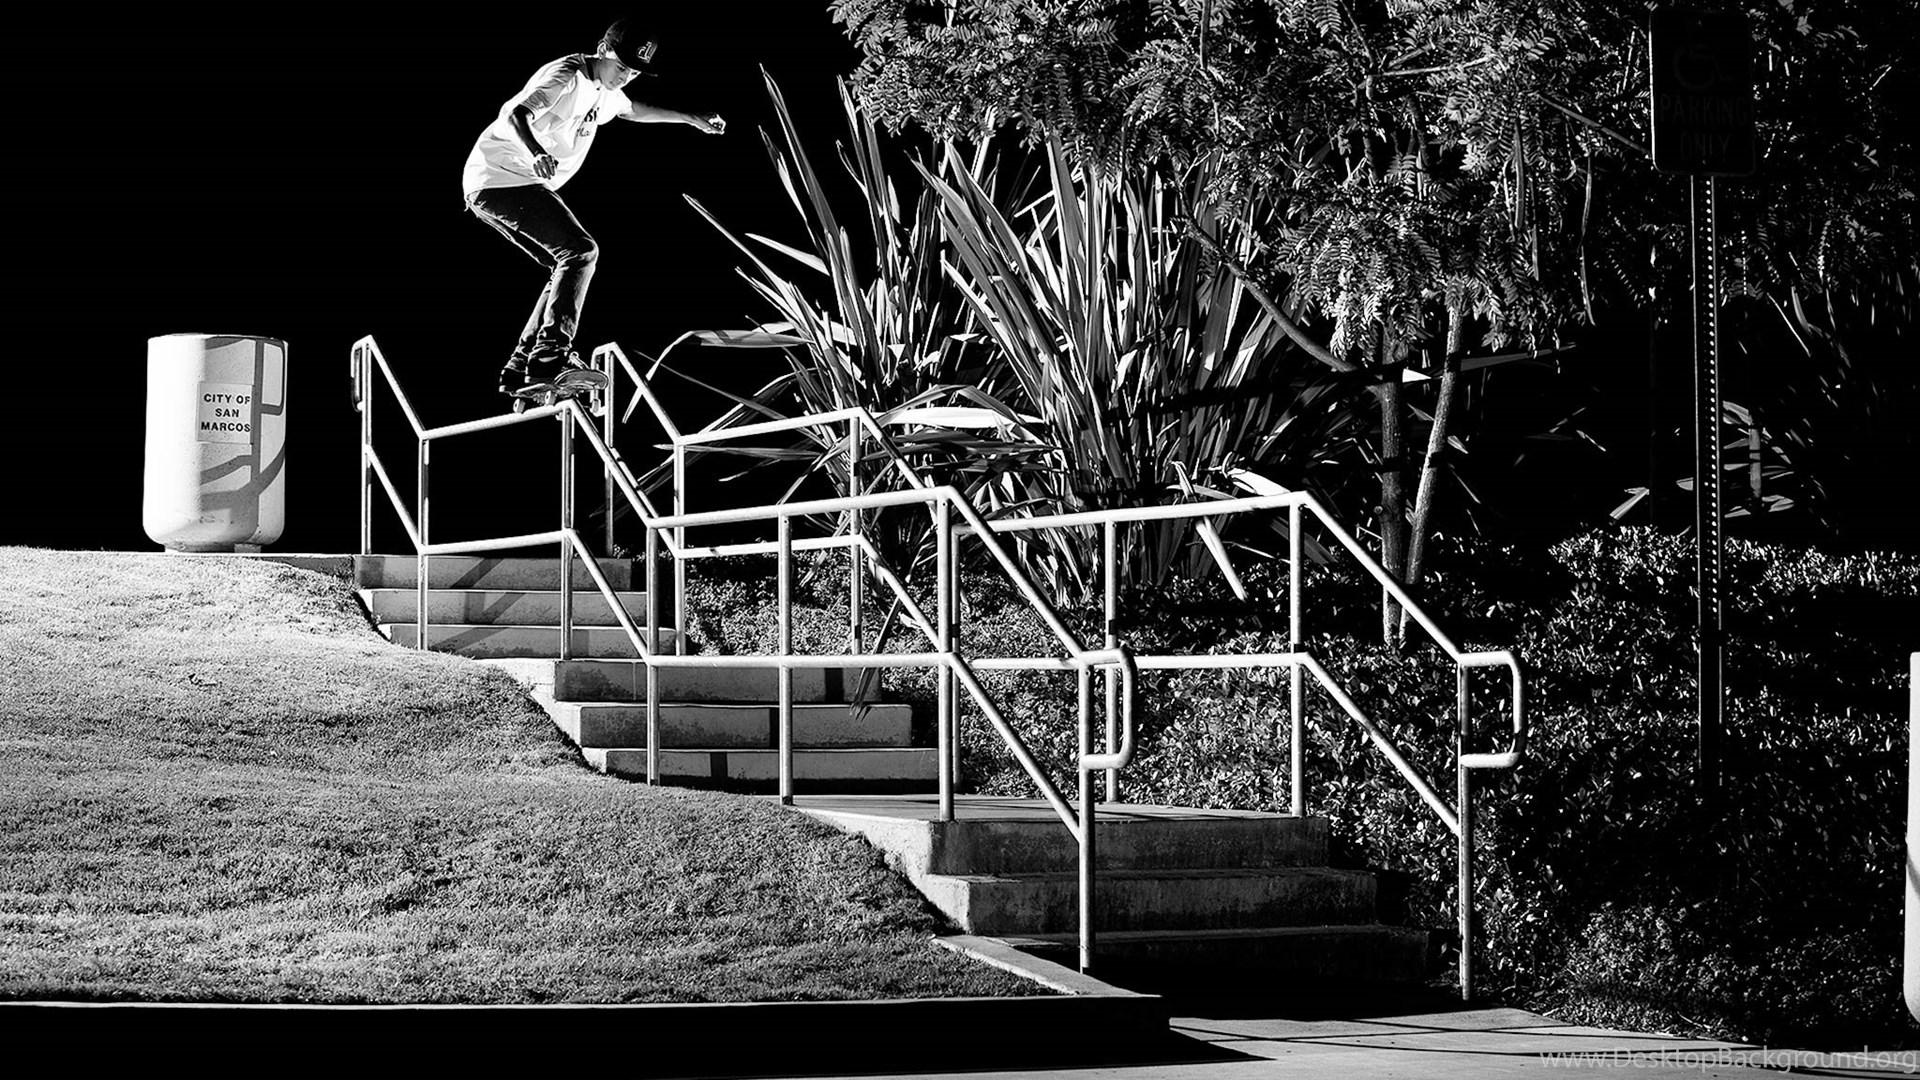 element skateboards nyjah huston wallpaper images